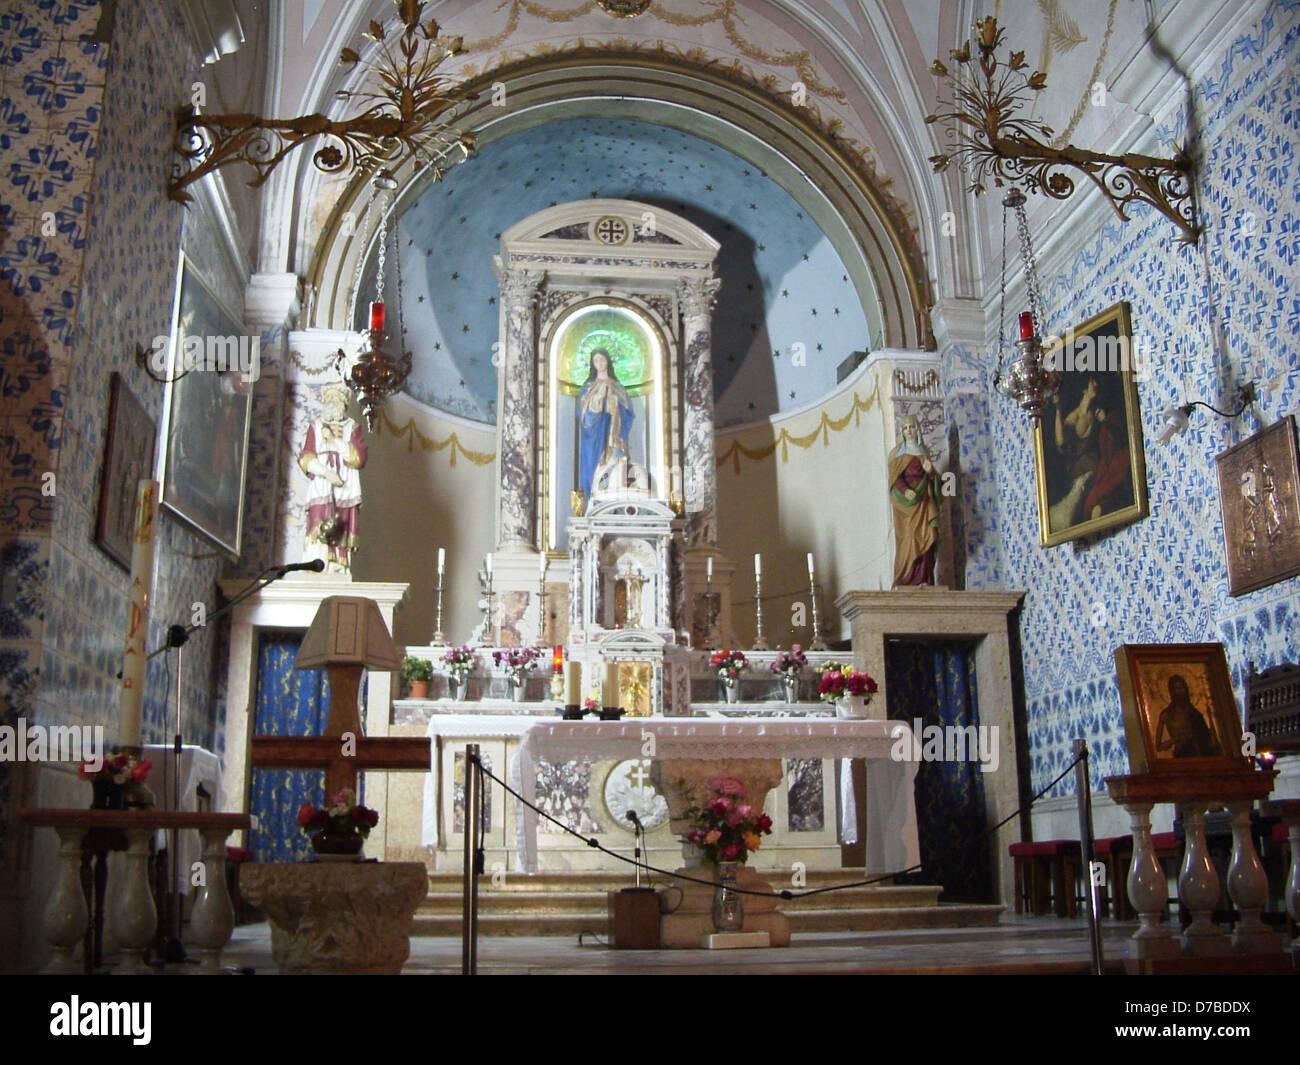 st johns the baptist church in ein kerem - Stock Image